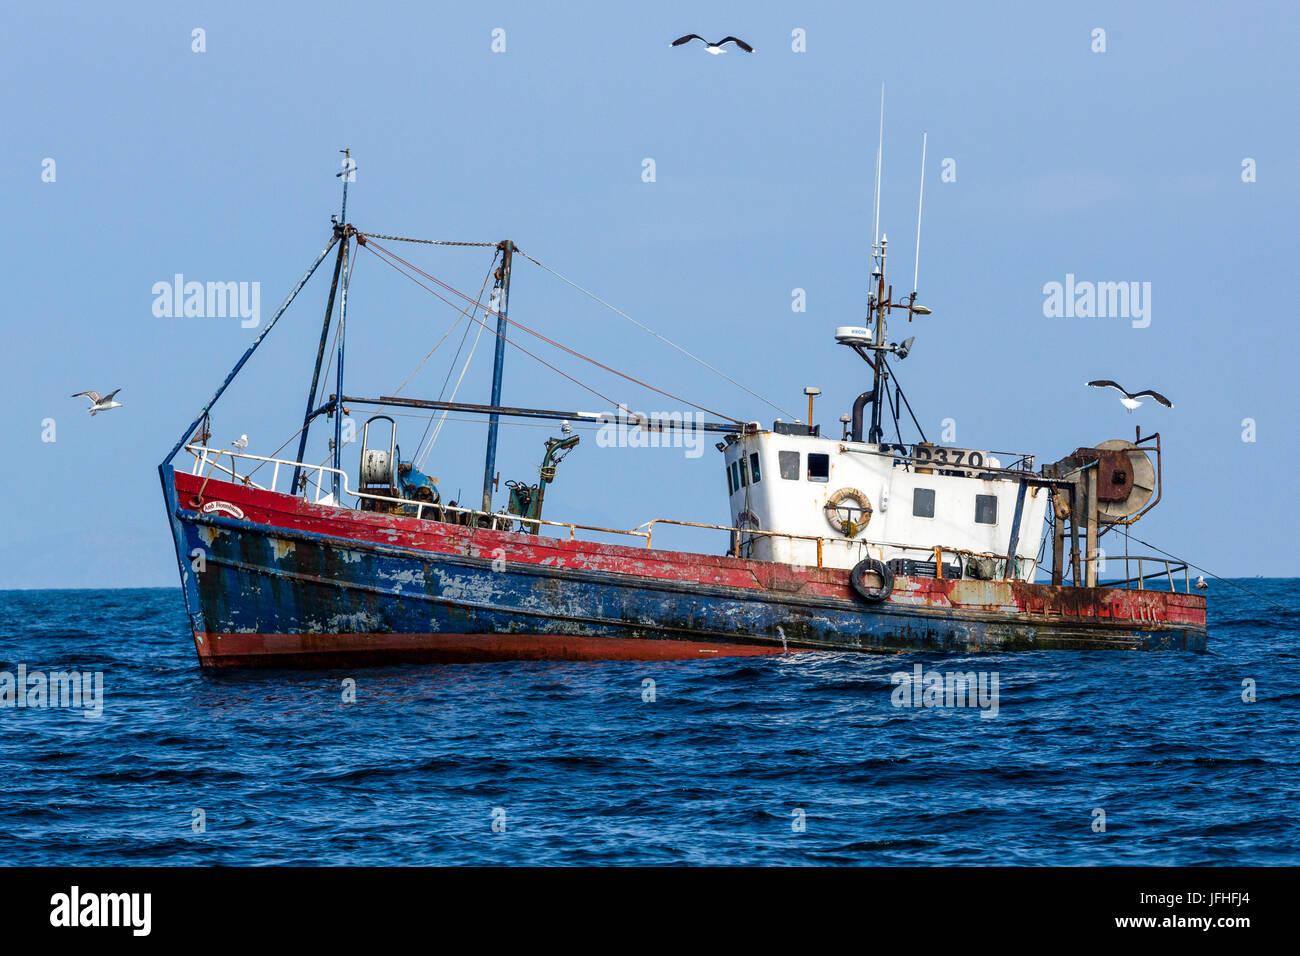 Fishing boat off West Coast of Ireland, near Valentia ...